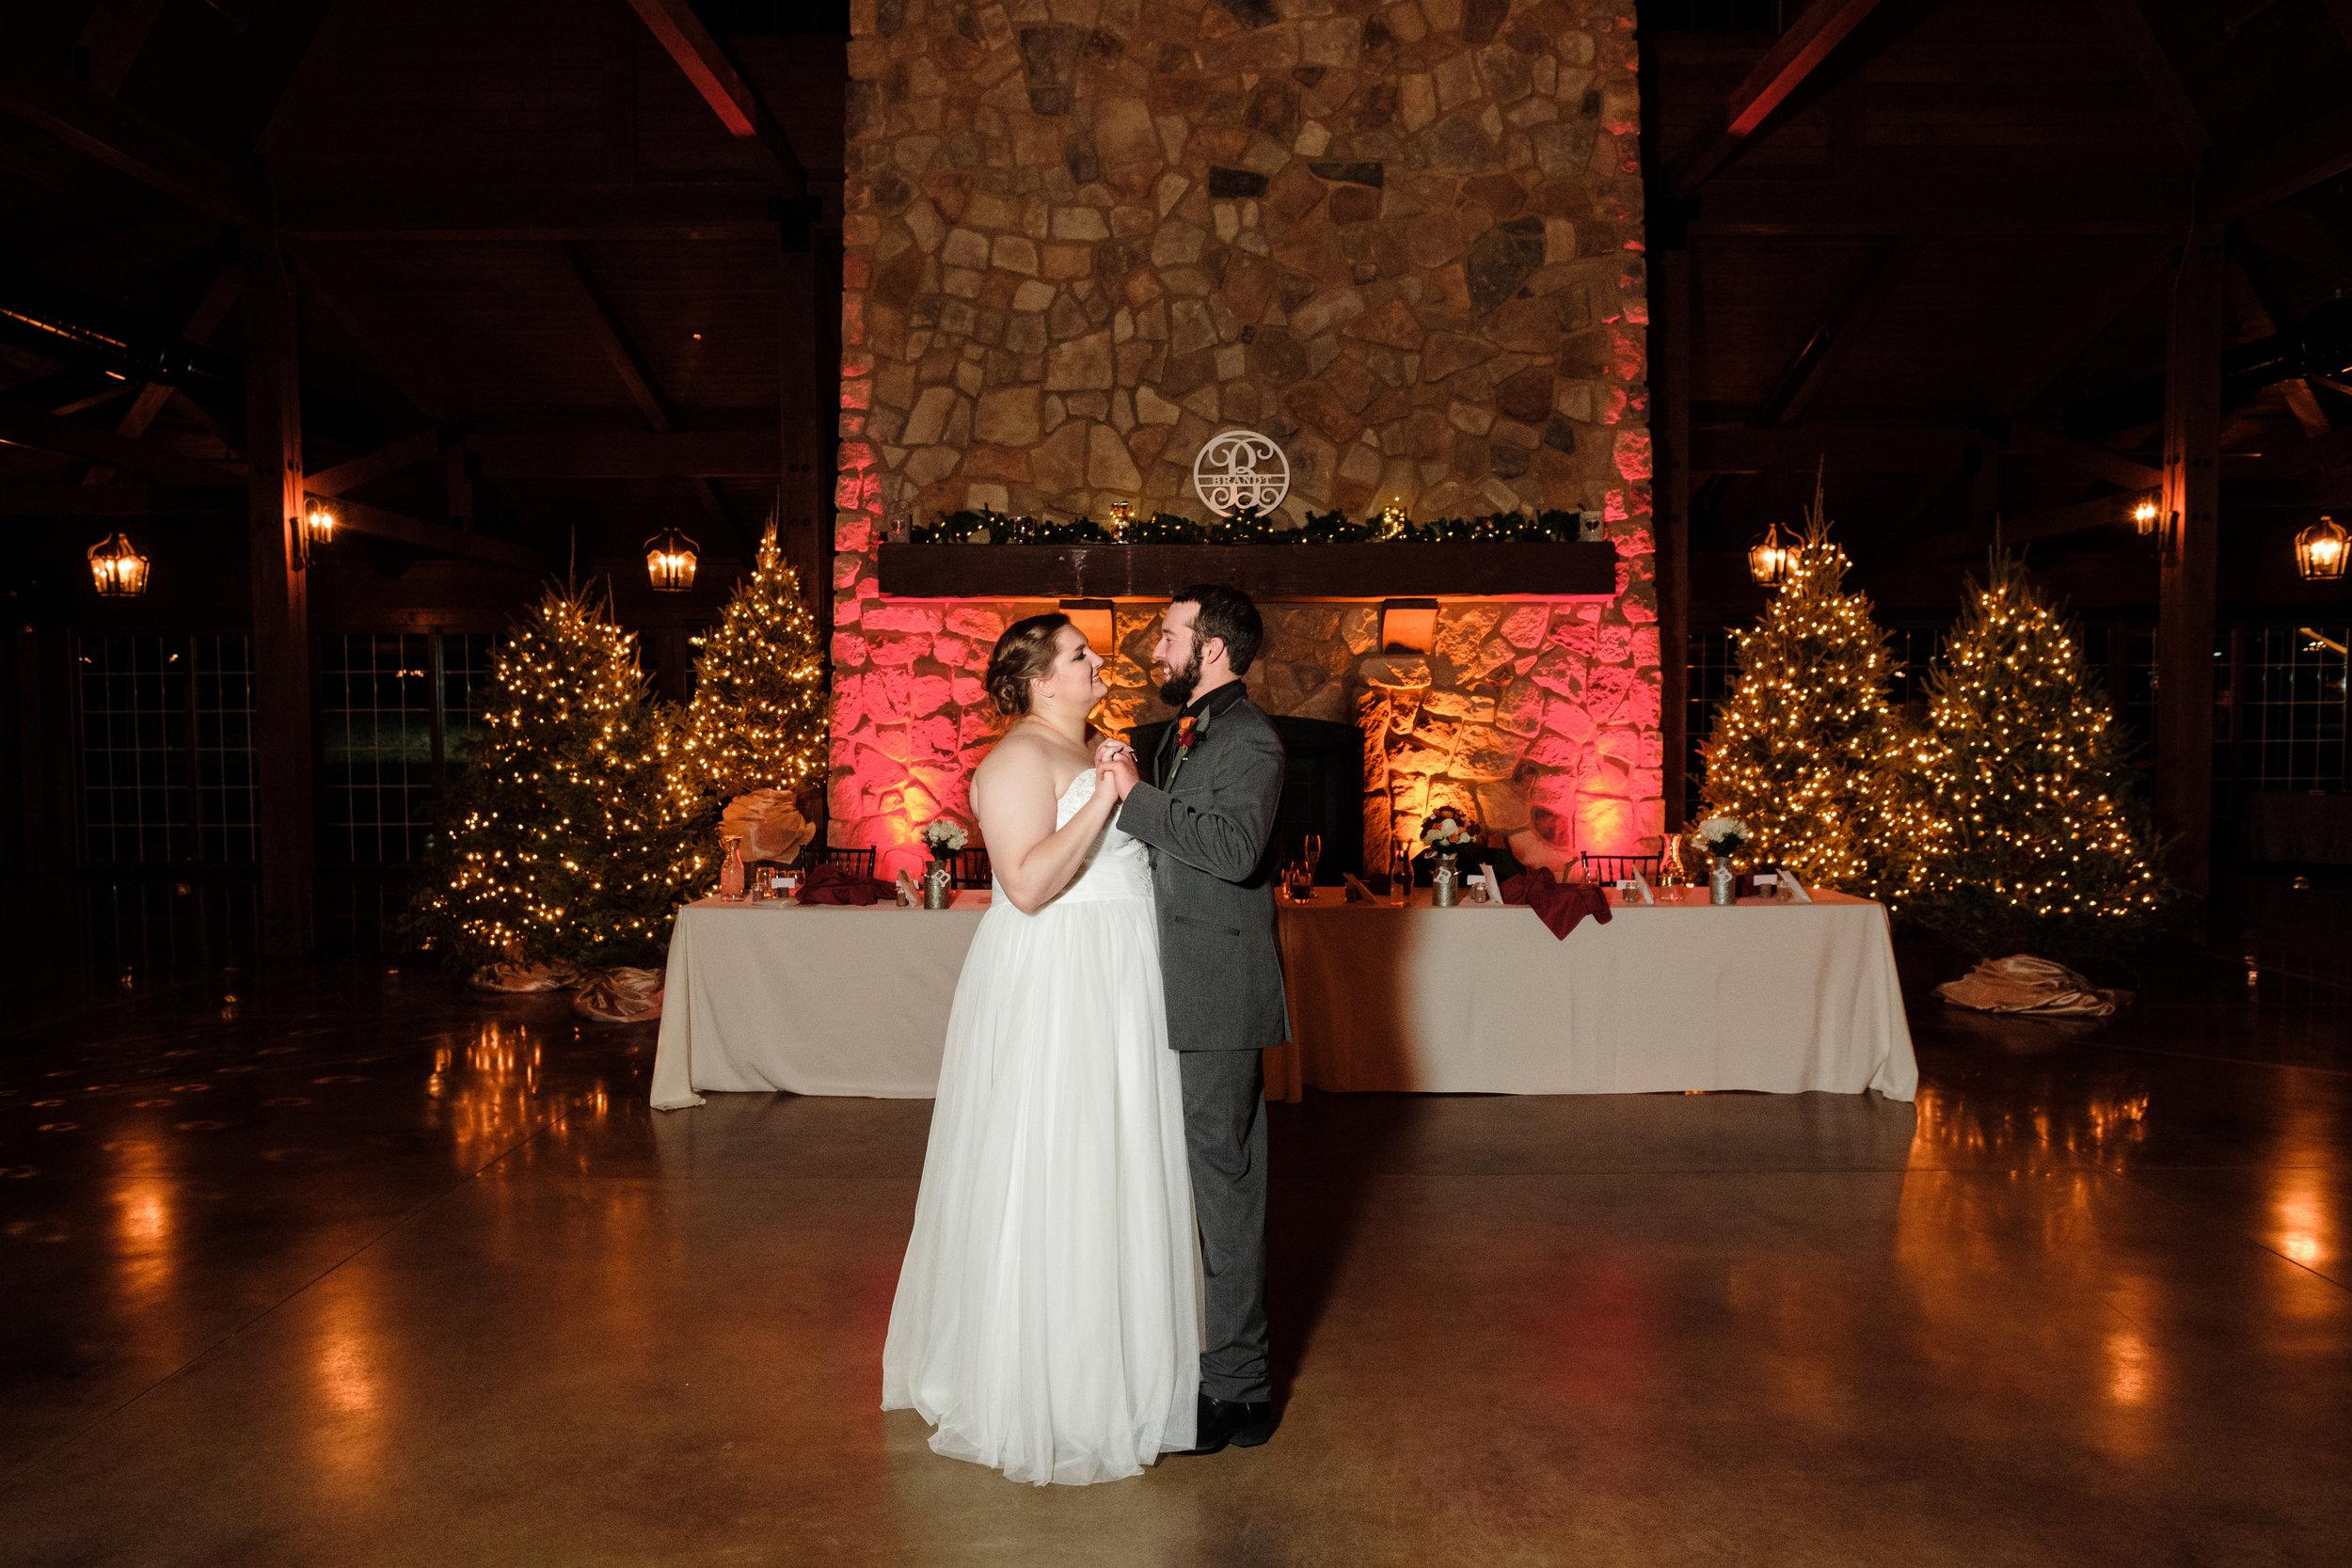 18-12-28 Corinne-Henry-Pavilion-Wedding-531.jpg